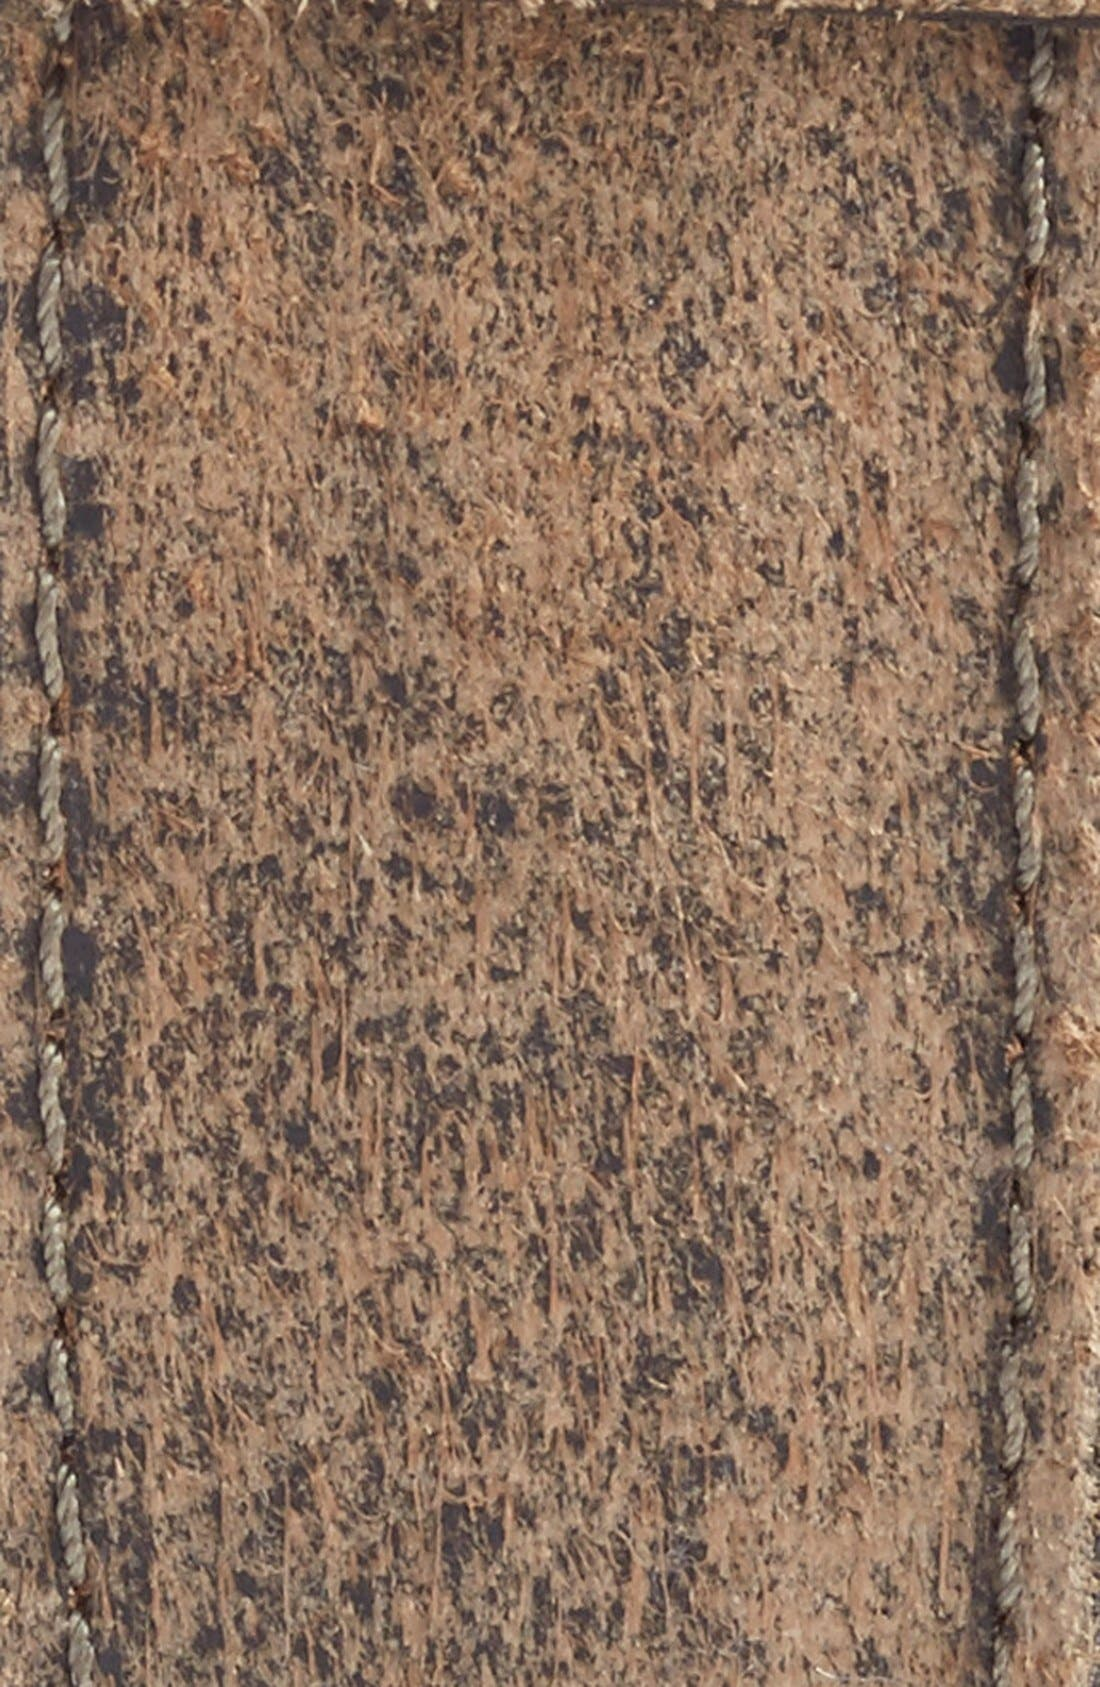 Sanded Leather Belt,                             Alternate thumbnail 2, color,                             Moss